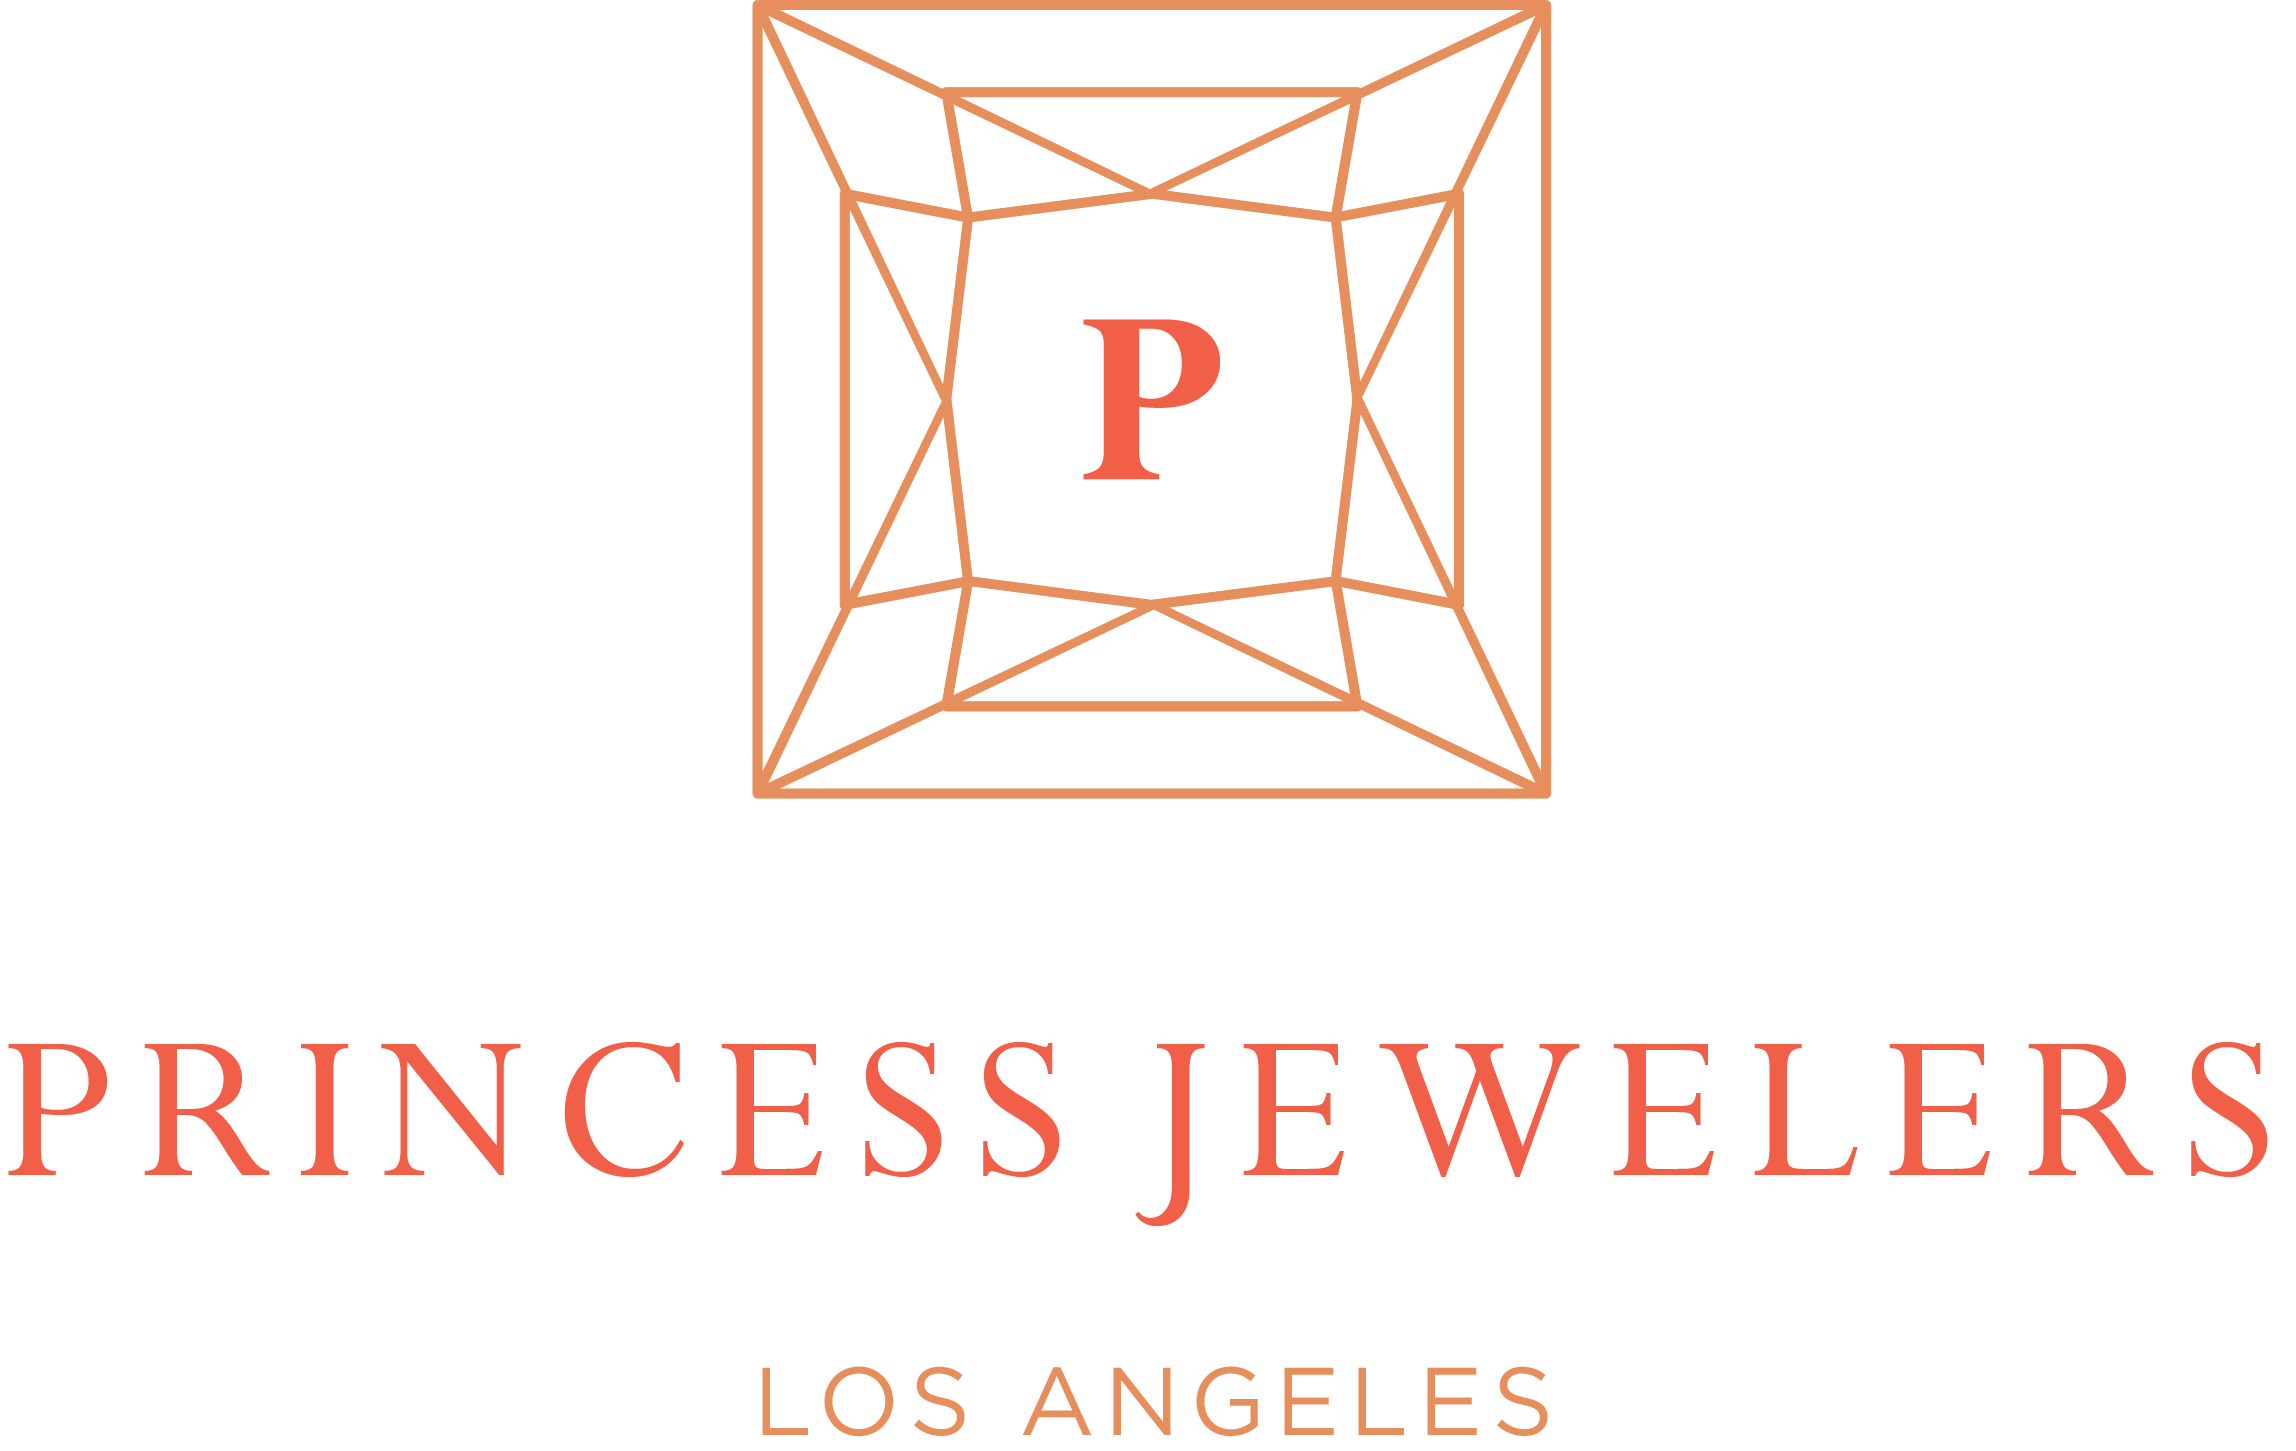 Princess Jewelers Los Angeles